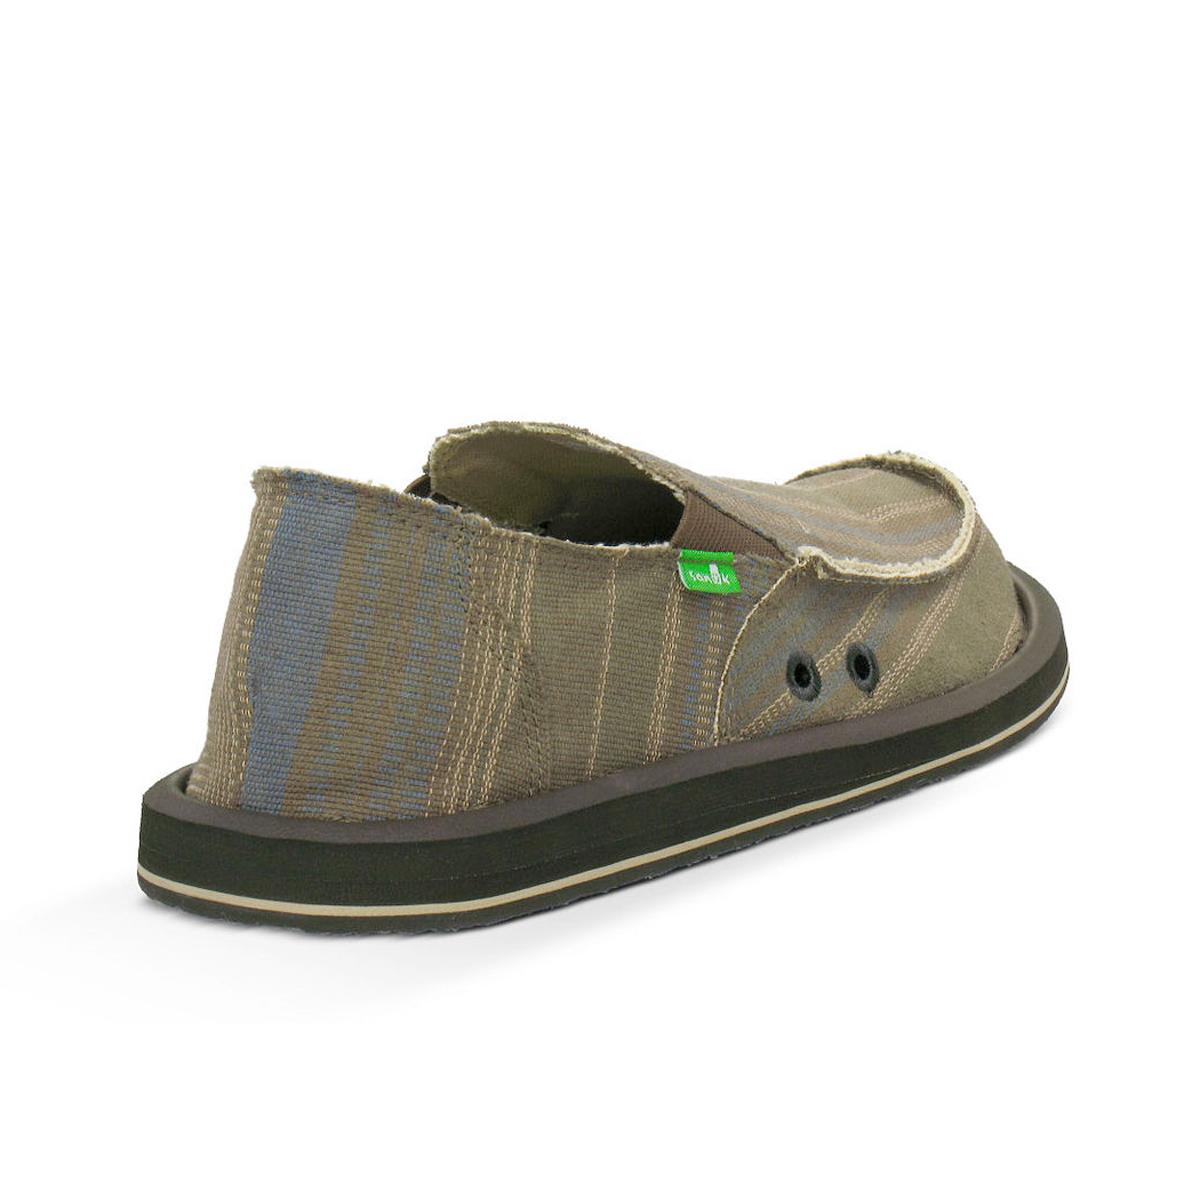 Sanuk-Donny-Sandals-Sidewalk-Surfers